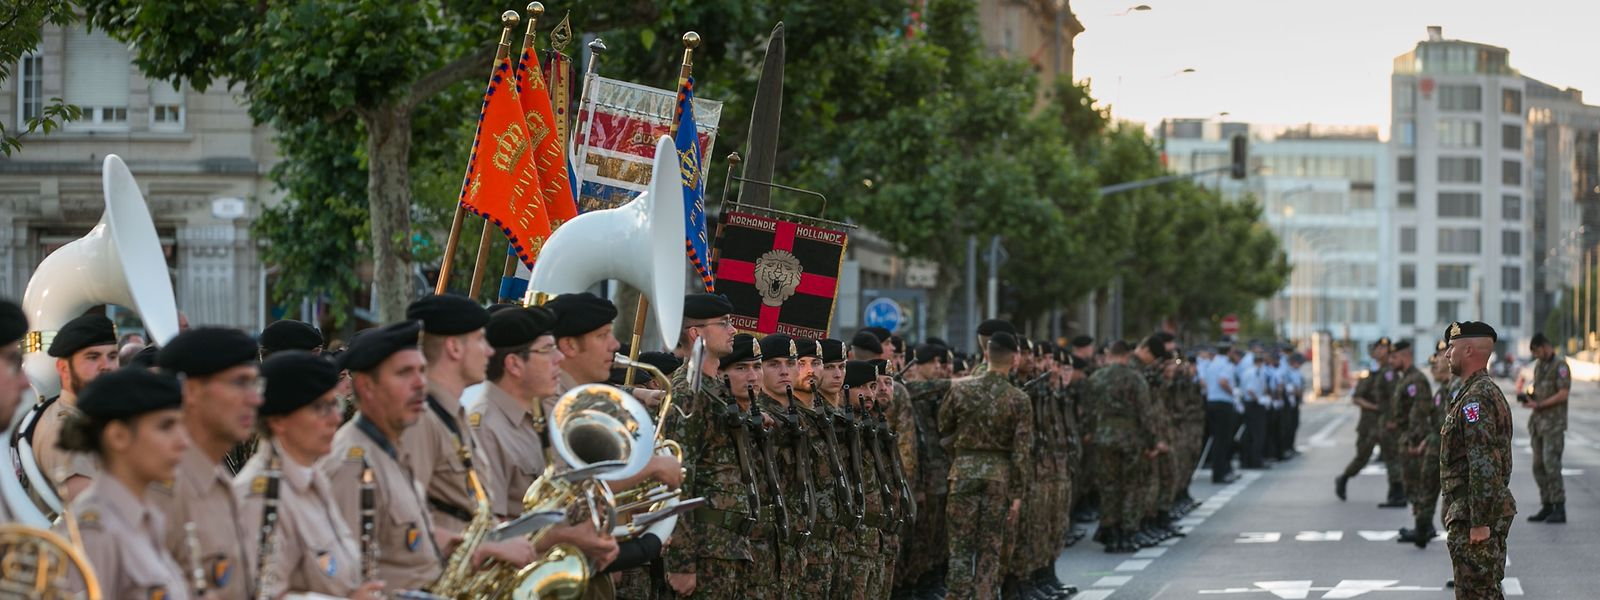 Probe Militärparade, Foto Lex Kleren